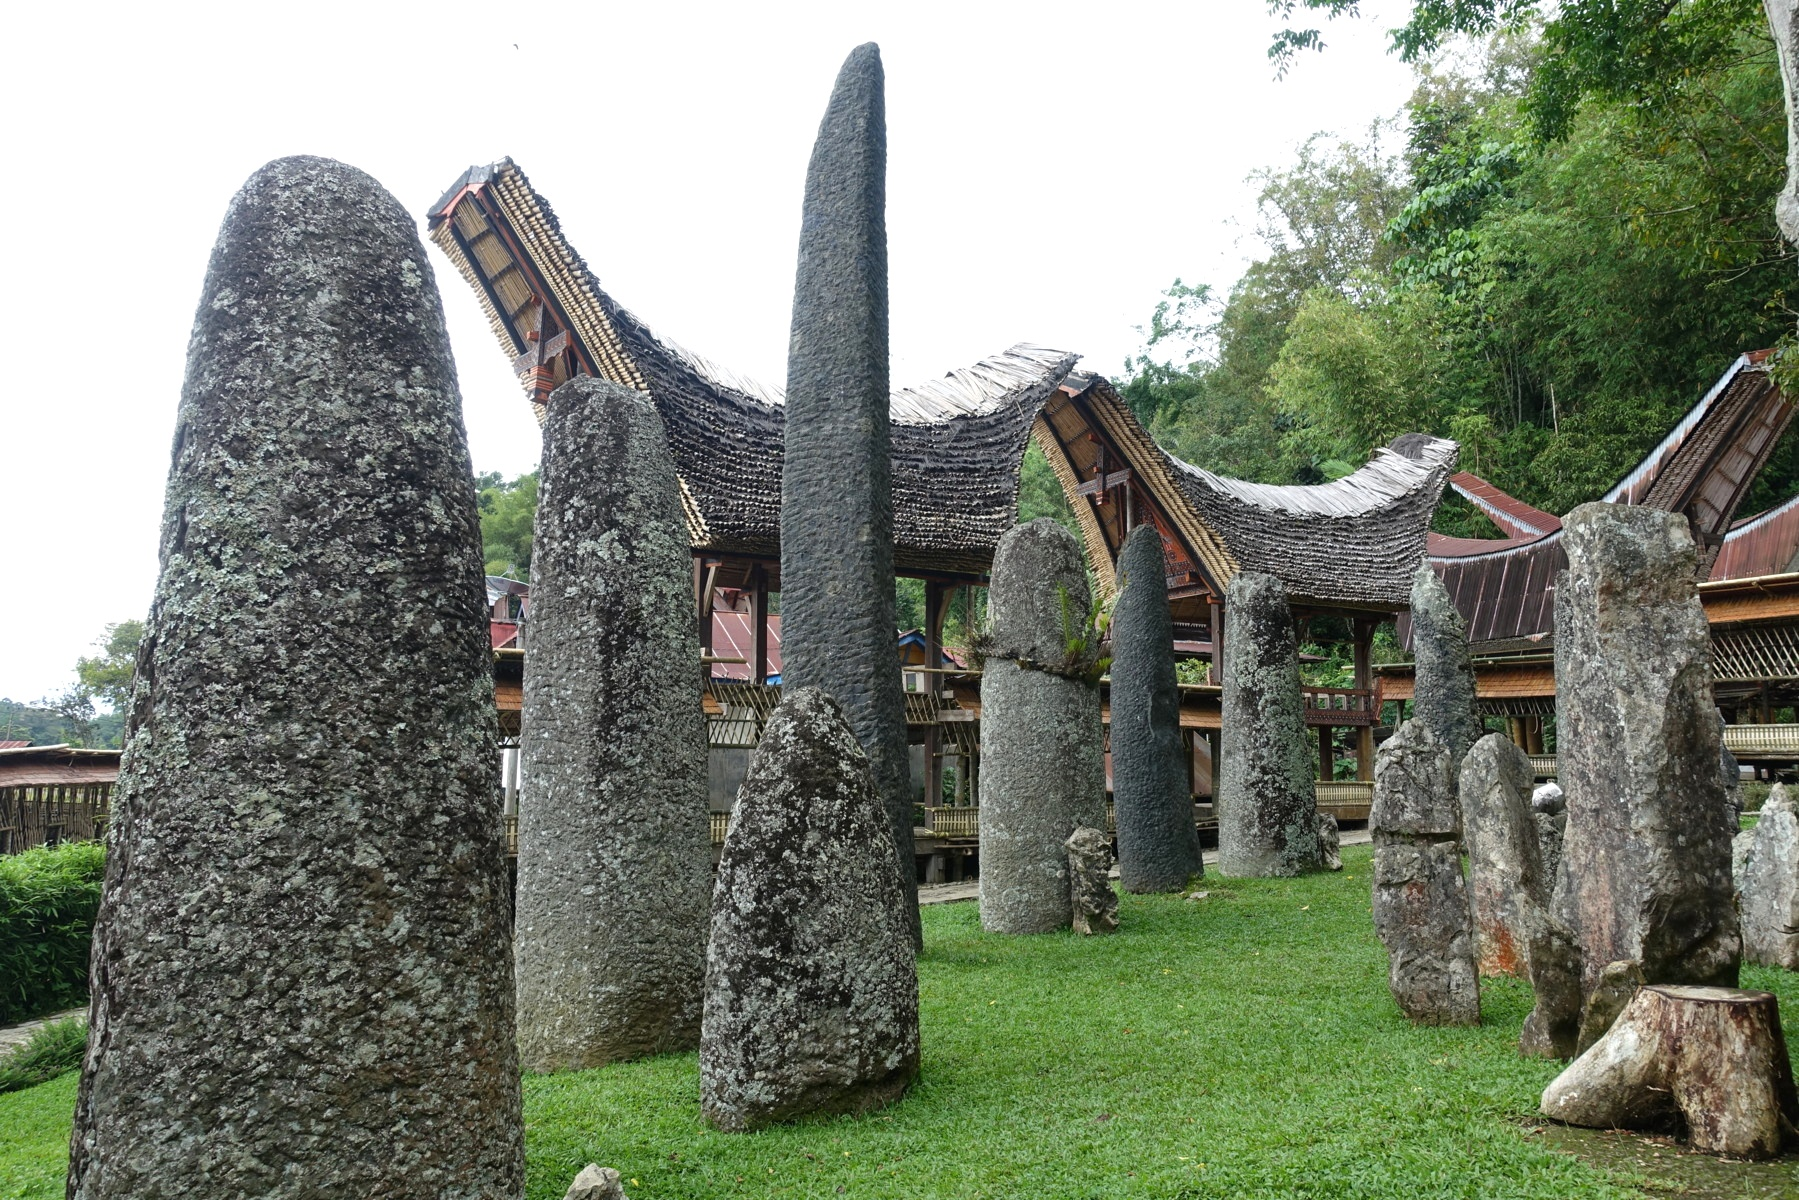 Indonesie_Sulawesi_Toraja_Rantepao DSC04817